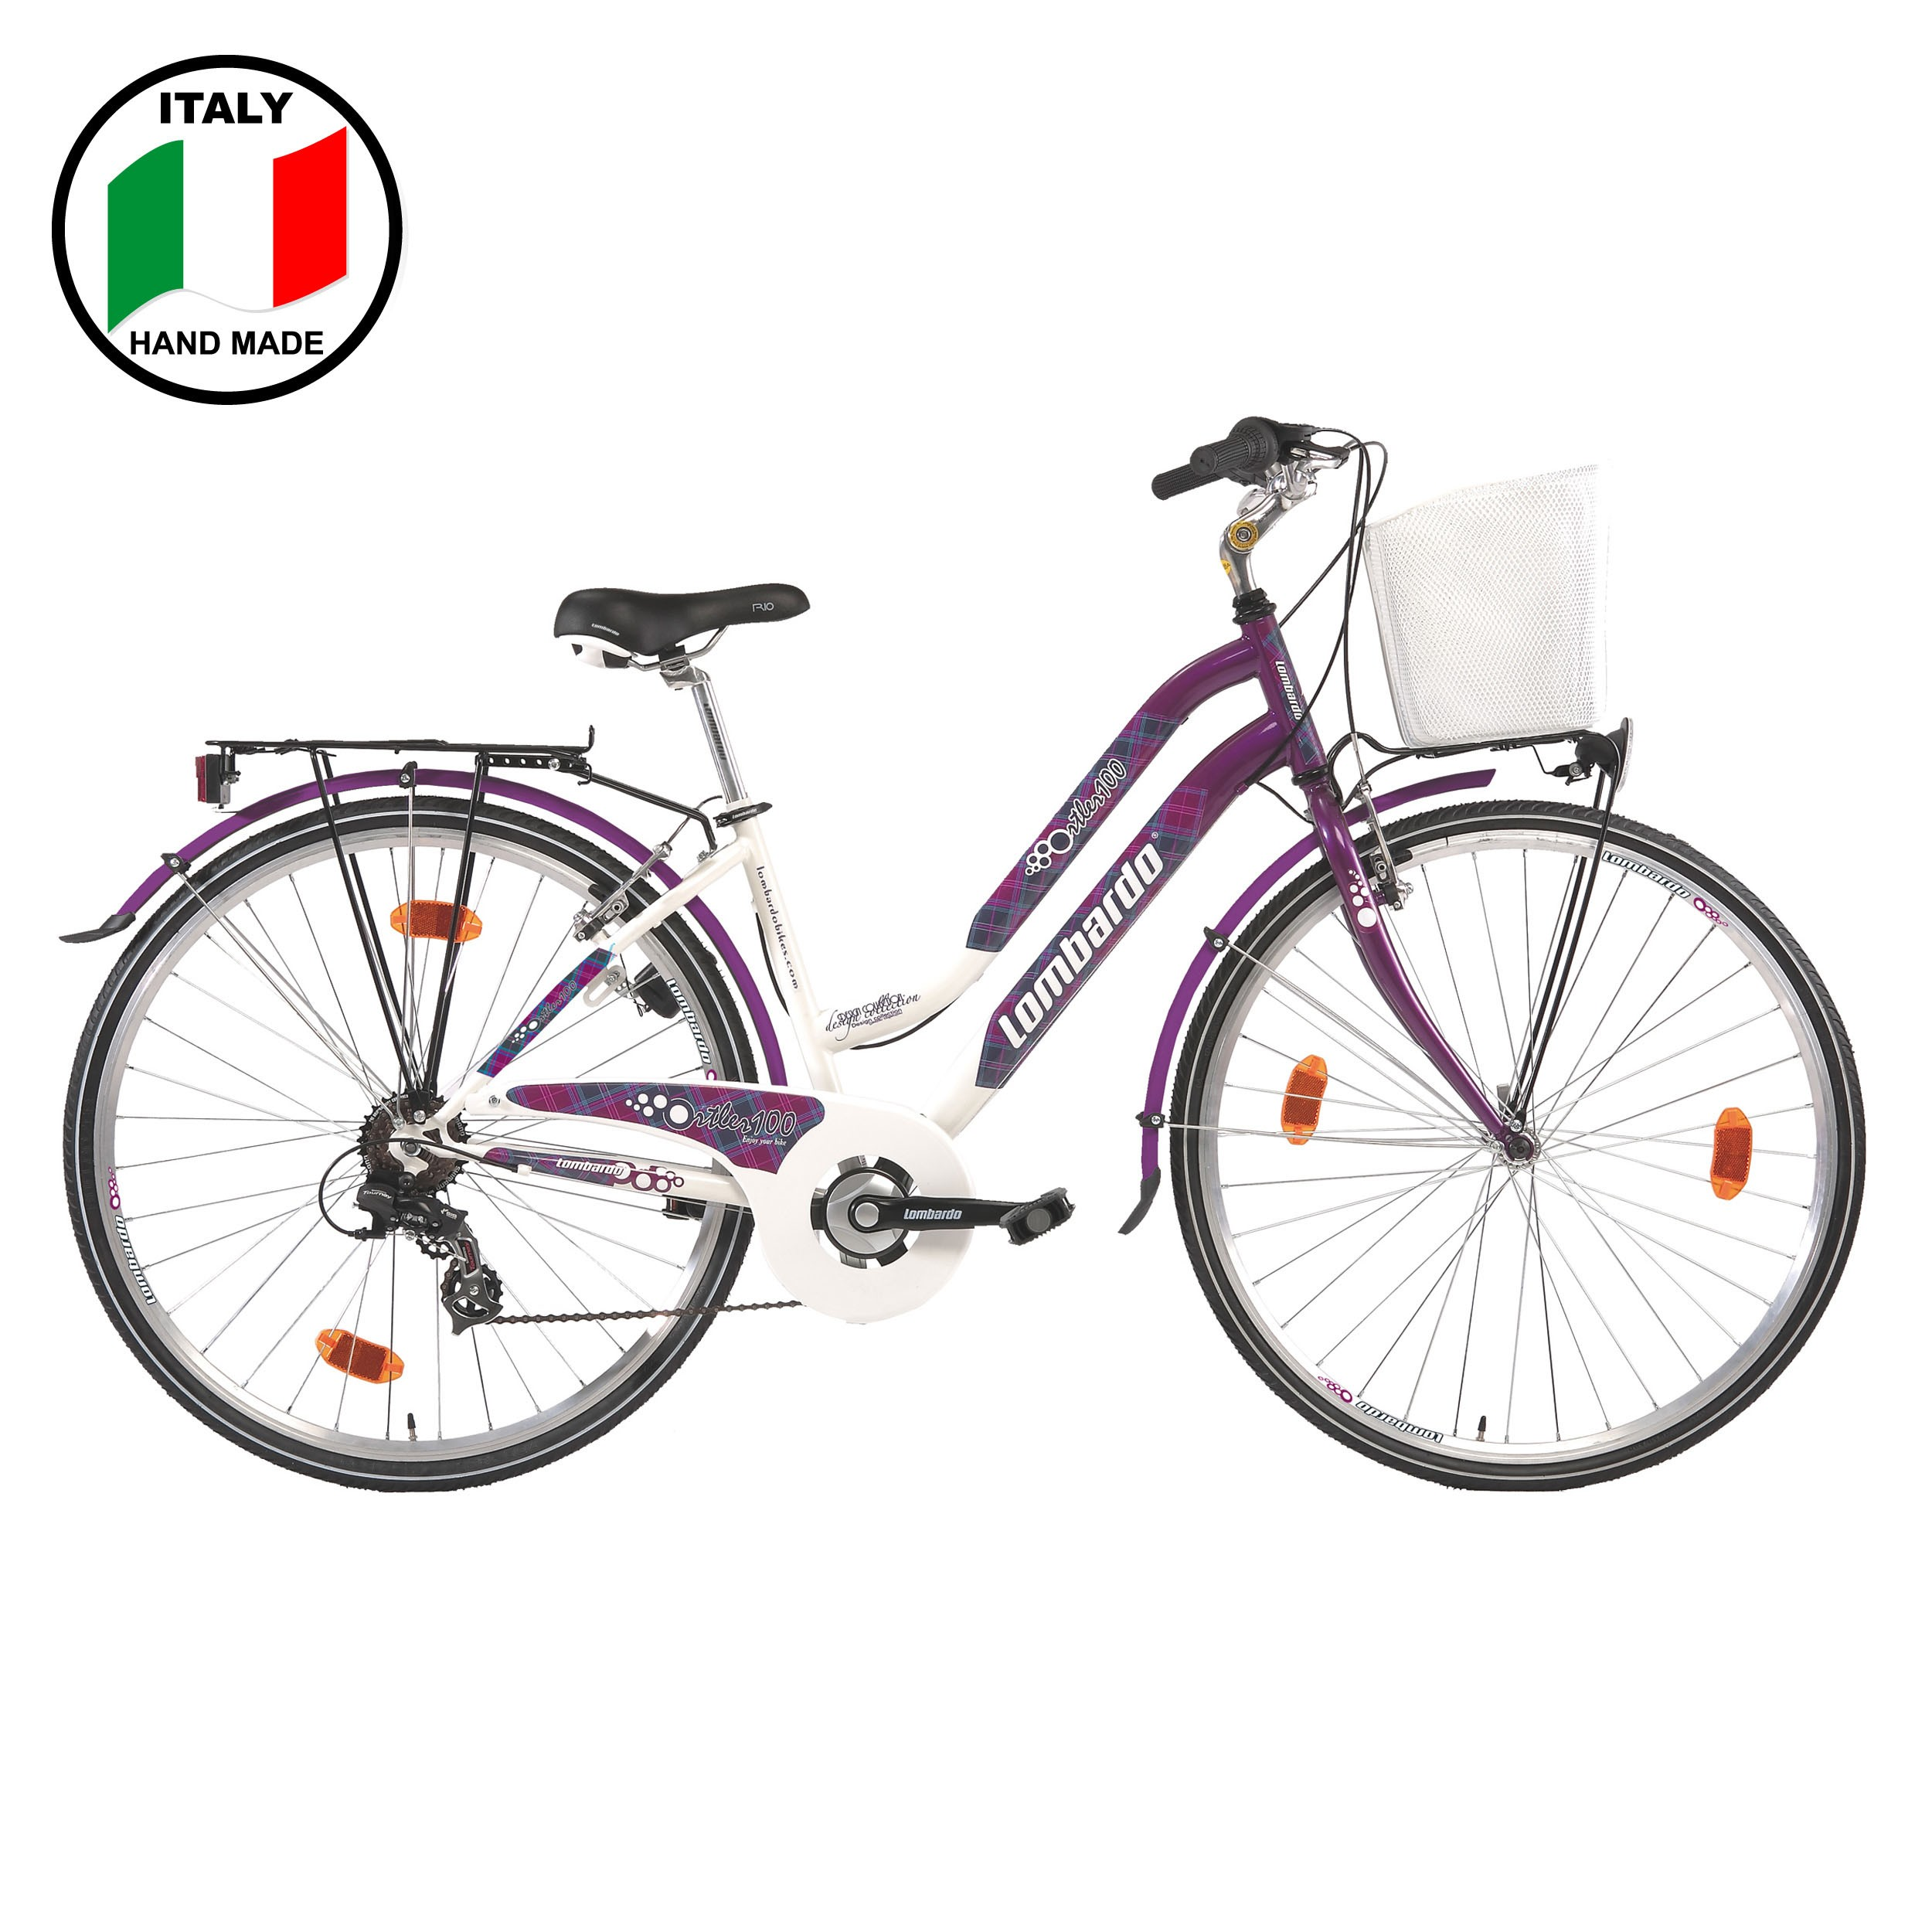 Lombardo Ortler 100 28 inch Women's Bike- Purple  and White